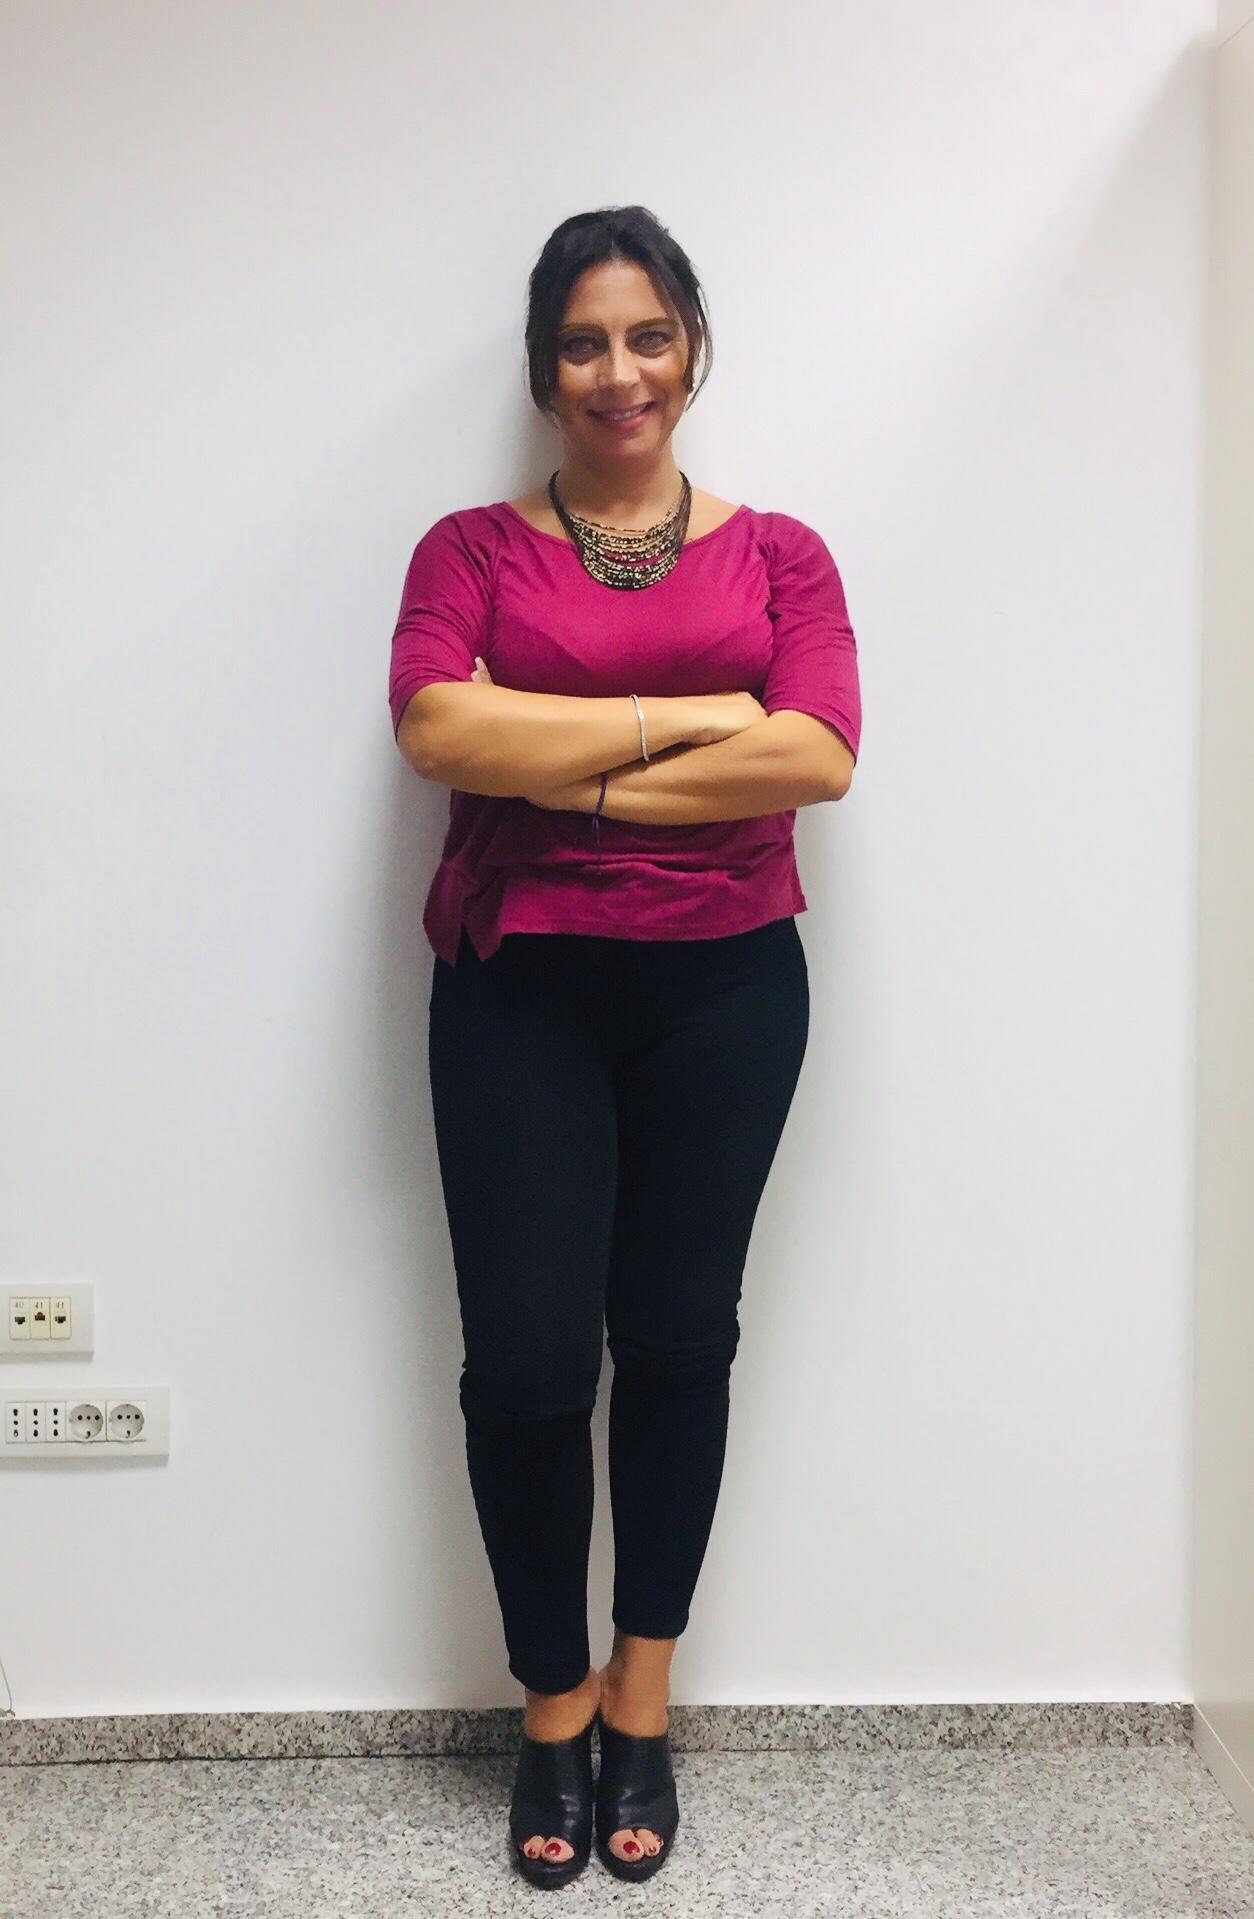 Sandra D'Aprile